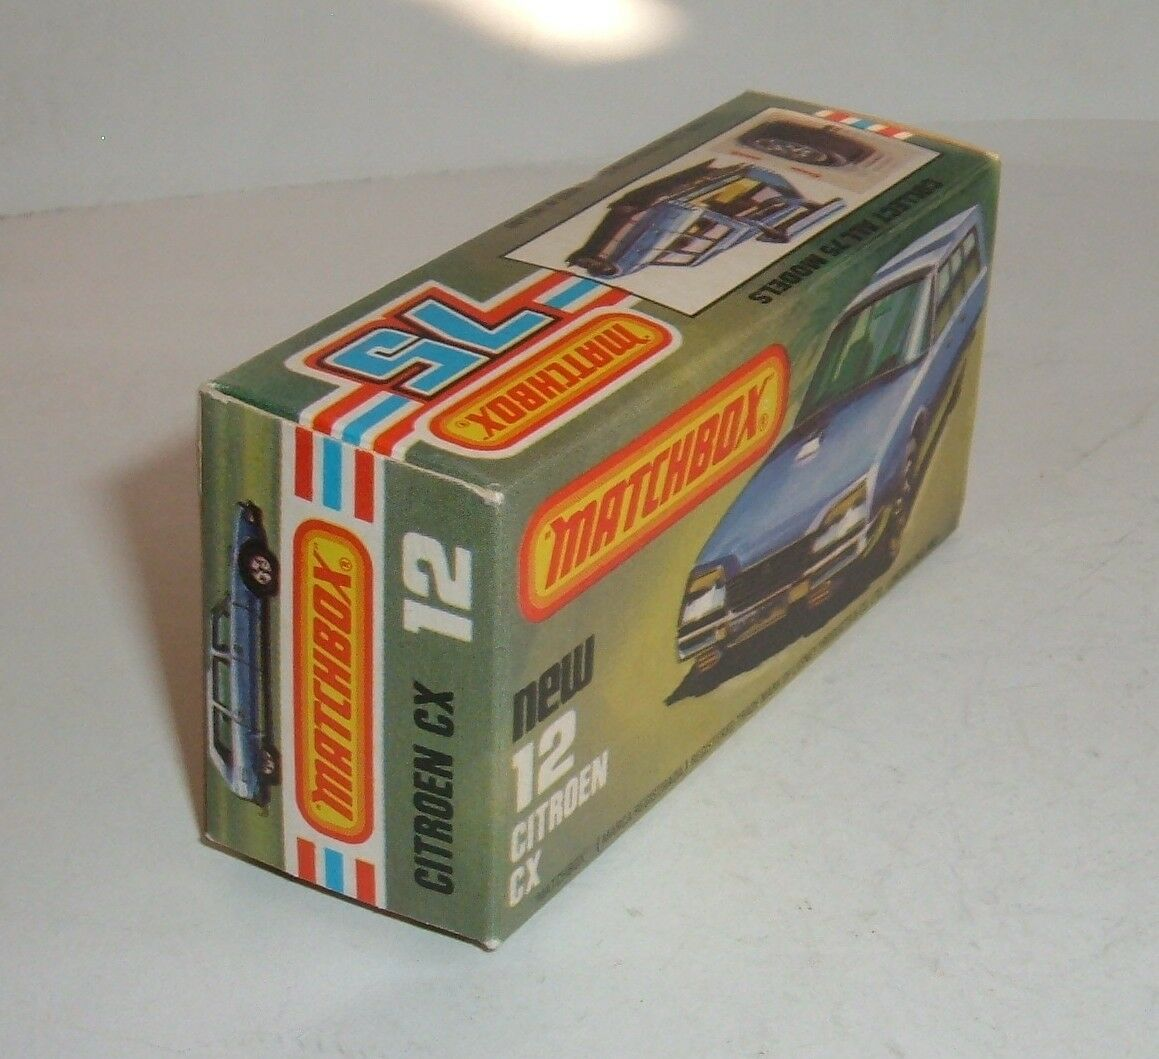 Matchbox Superfast Superfast Superfast No 12, Citroen CX, - Excelente Como Nuevo. e56147